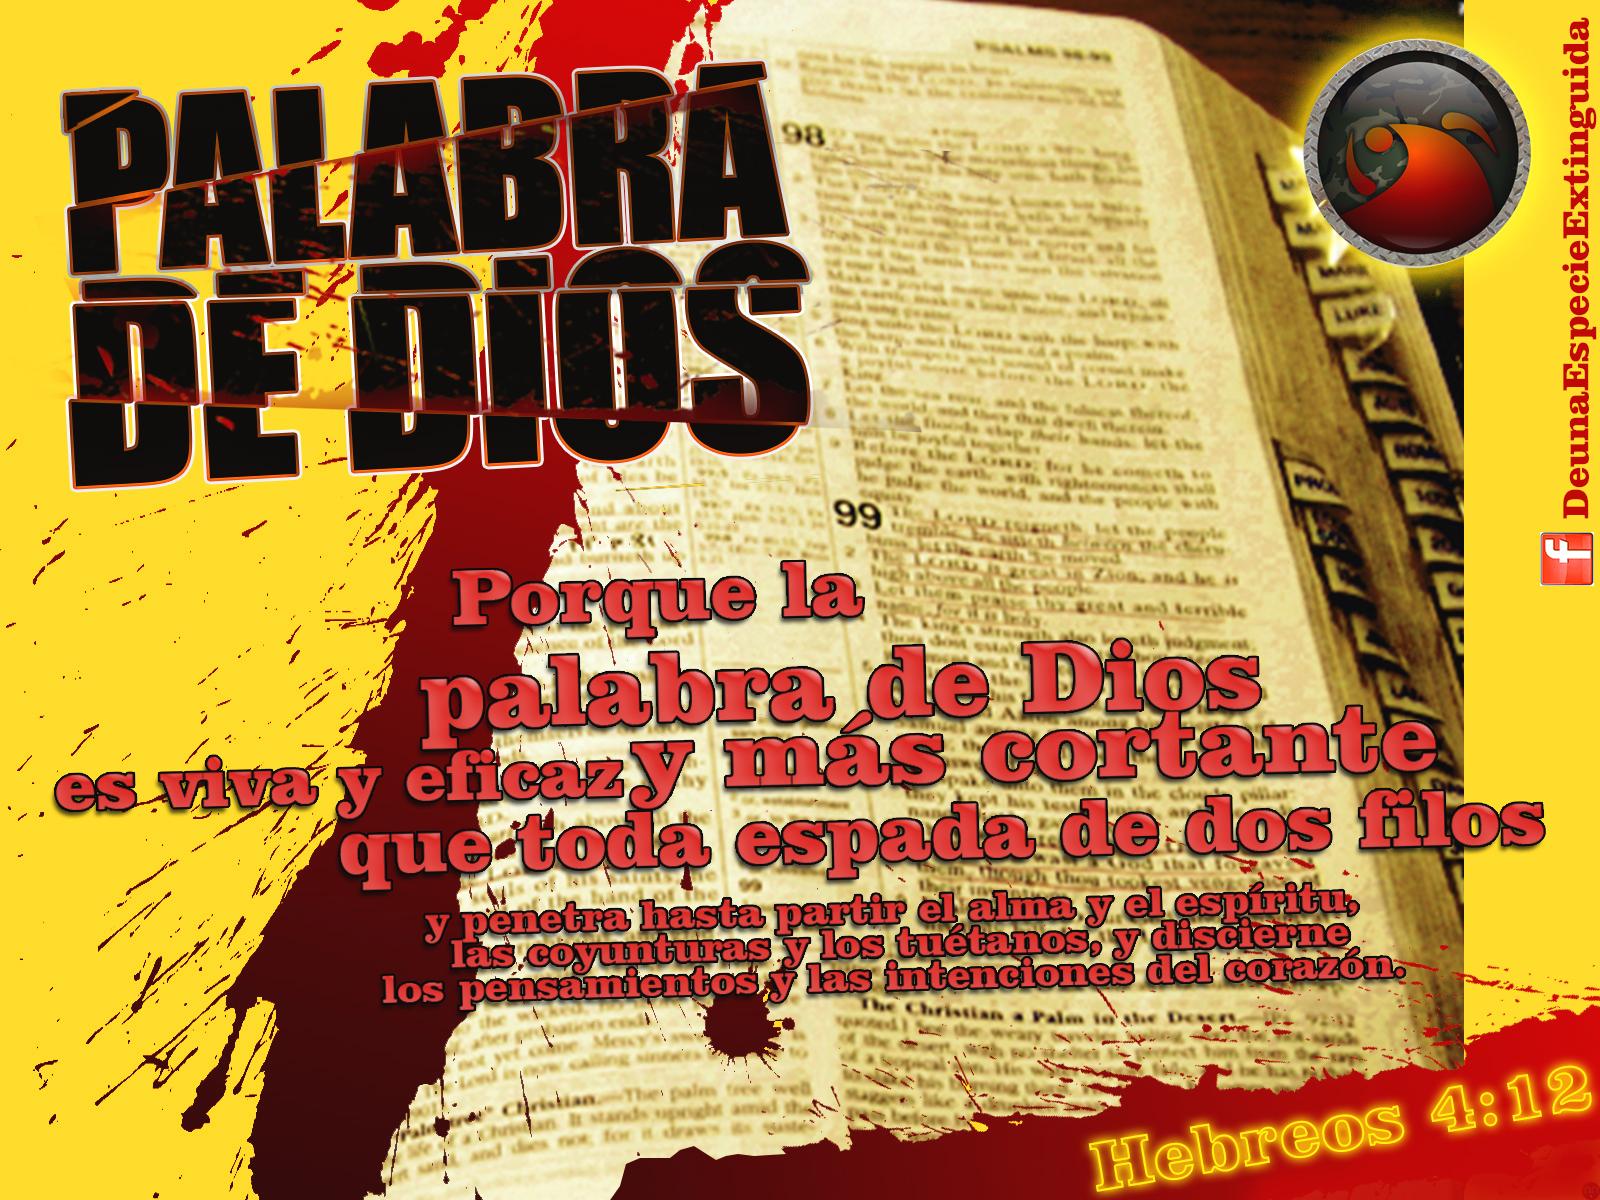 La Reforma - Martin Lutero - image ESPADA+DE+DOS+FILOS on http://adulamcrew.cl